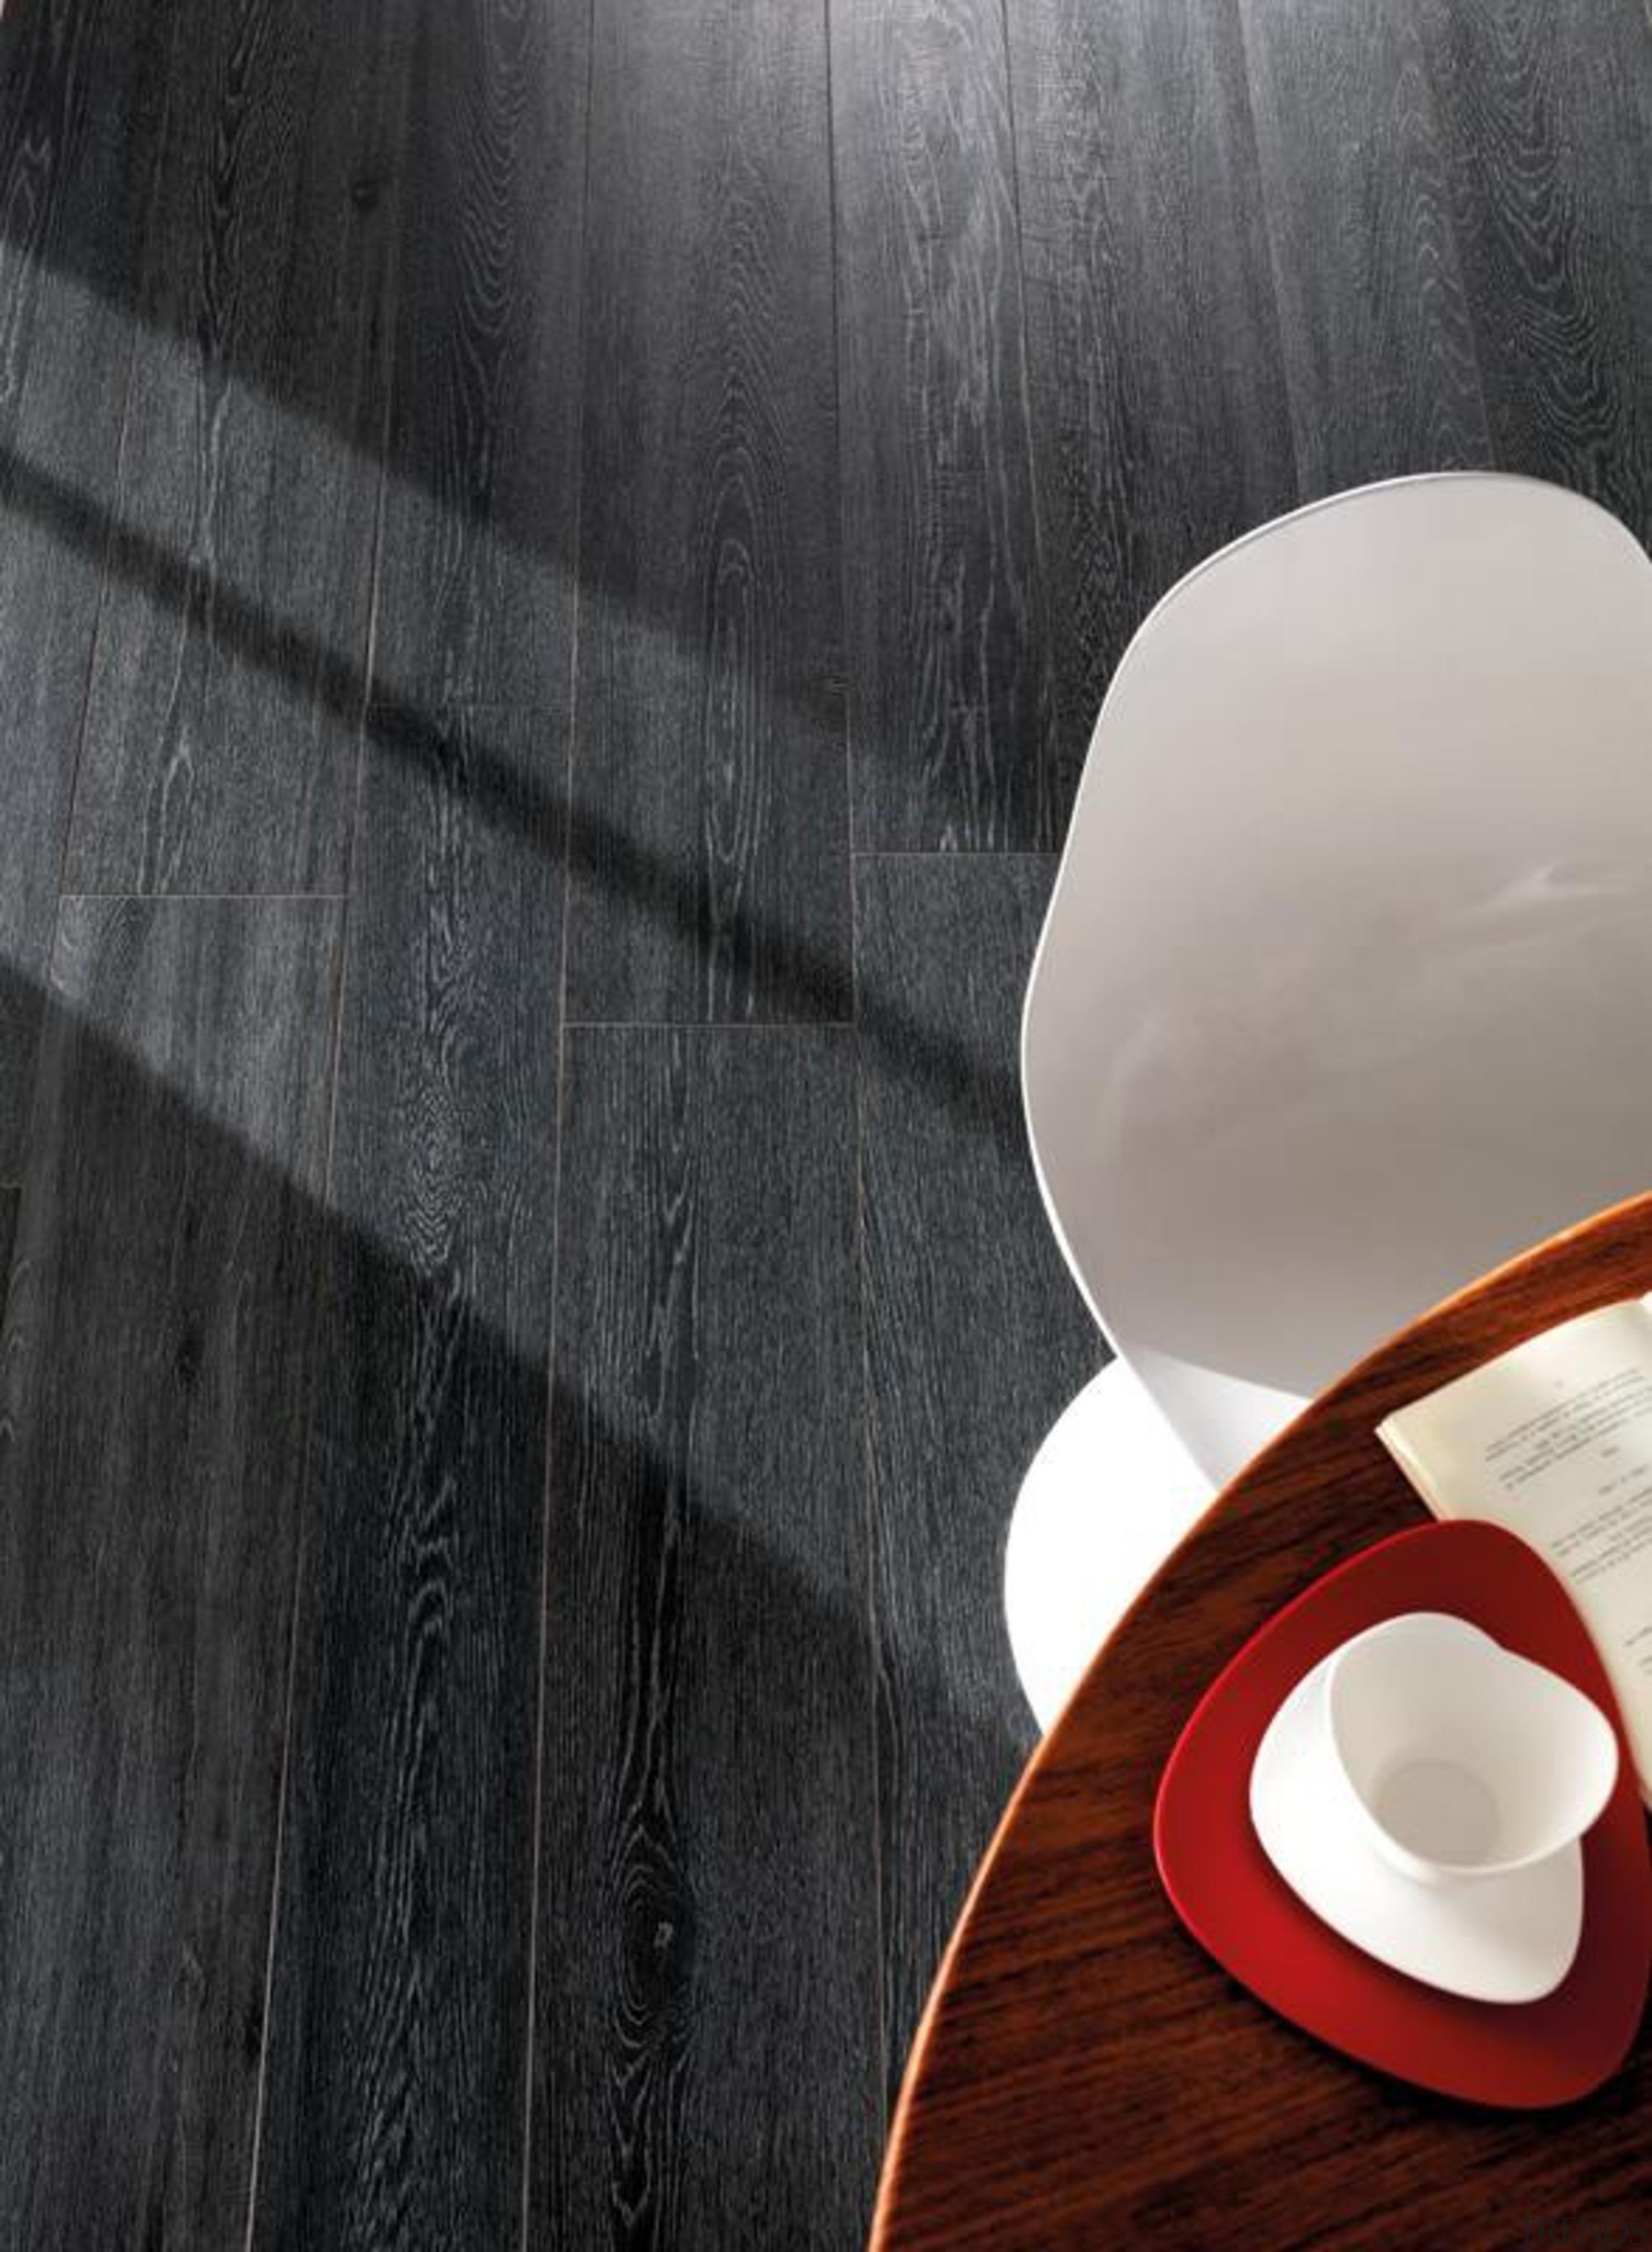 Bioplank oak lava interior wood look floor tiles. cup, floor, flooring, product design, still life photography, black, gray